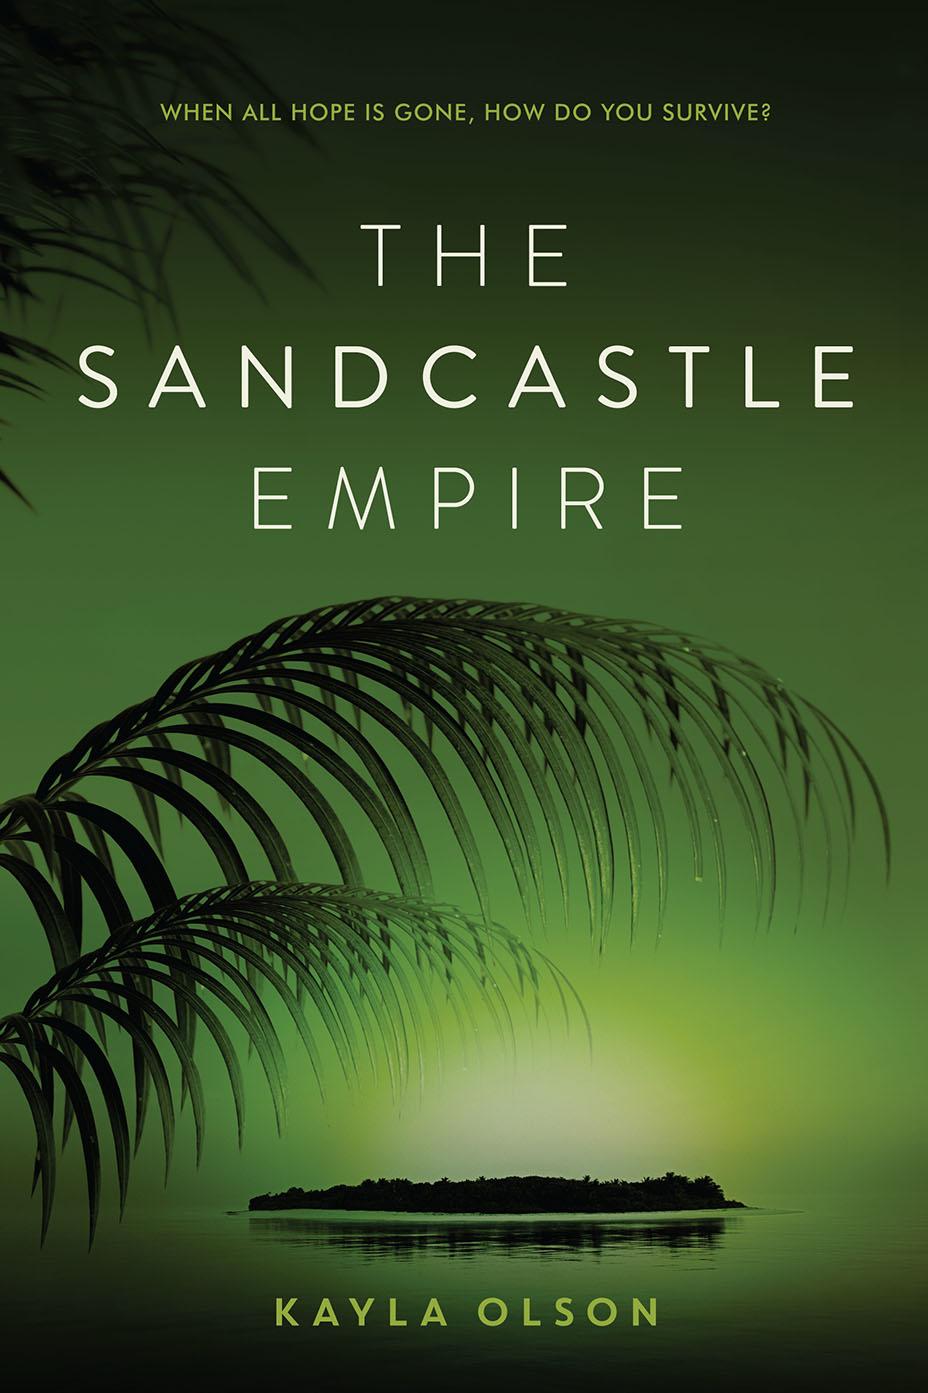 sandcastle_empire_book_cover_-_embed_-_2016